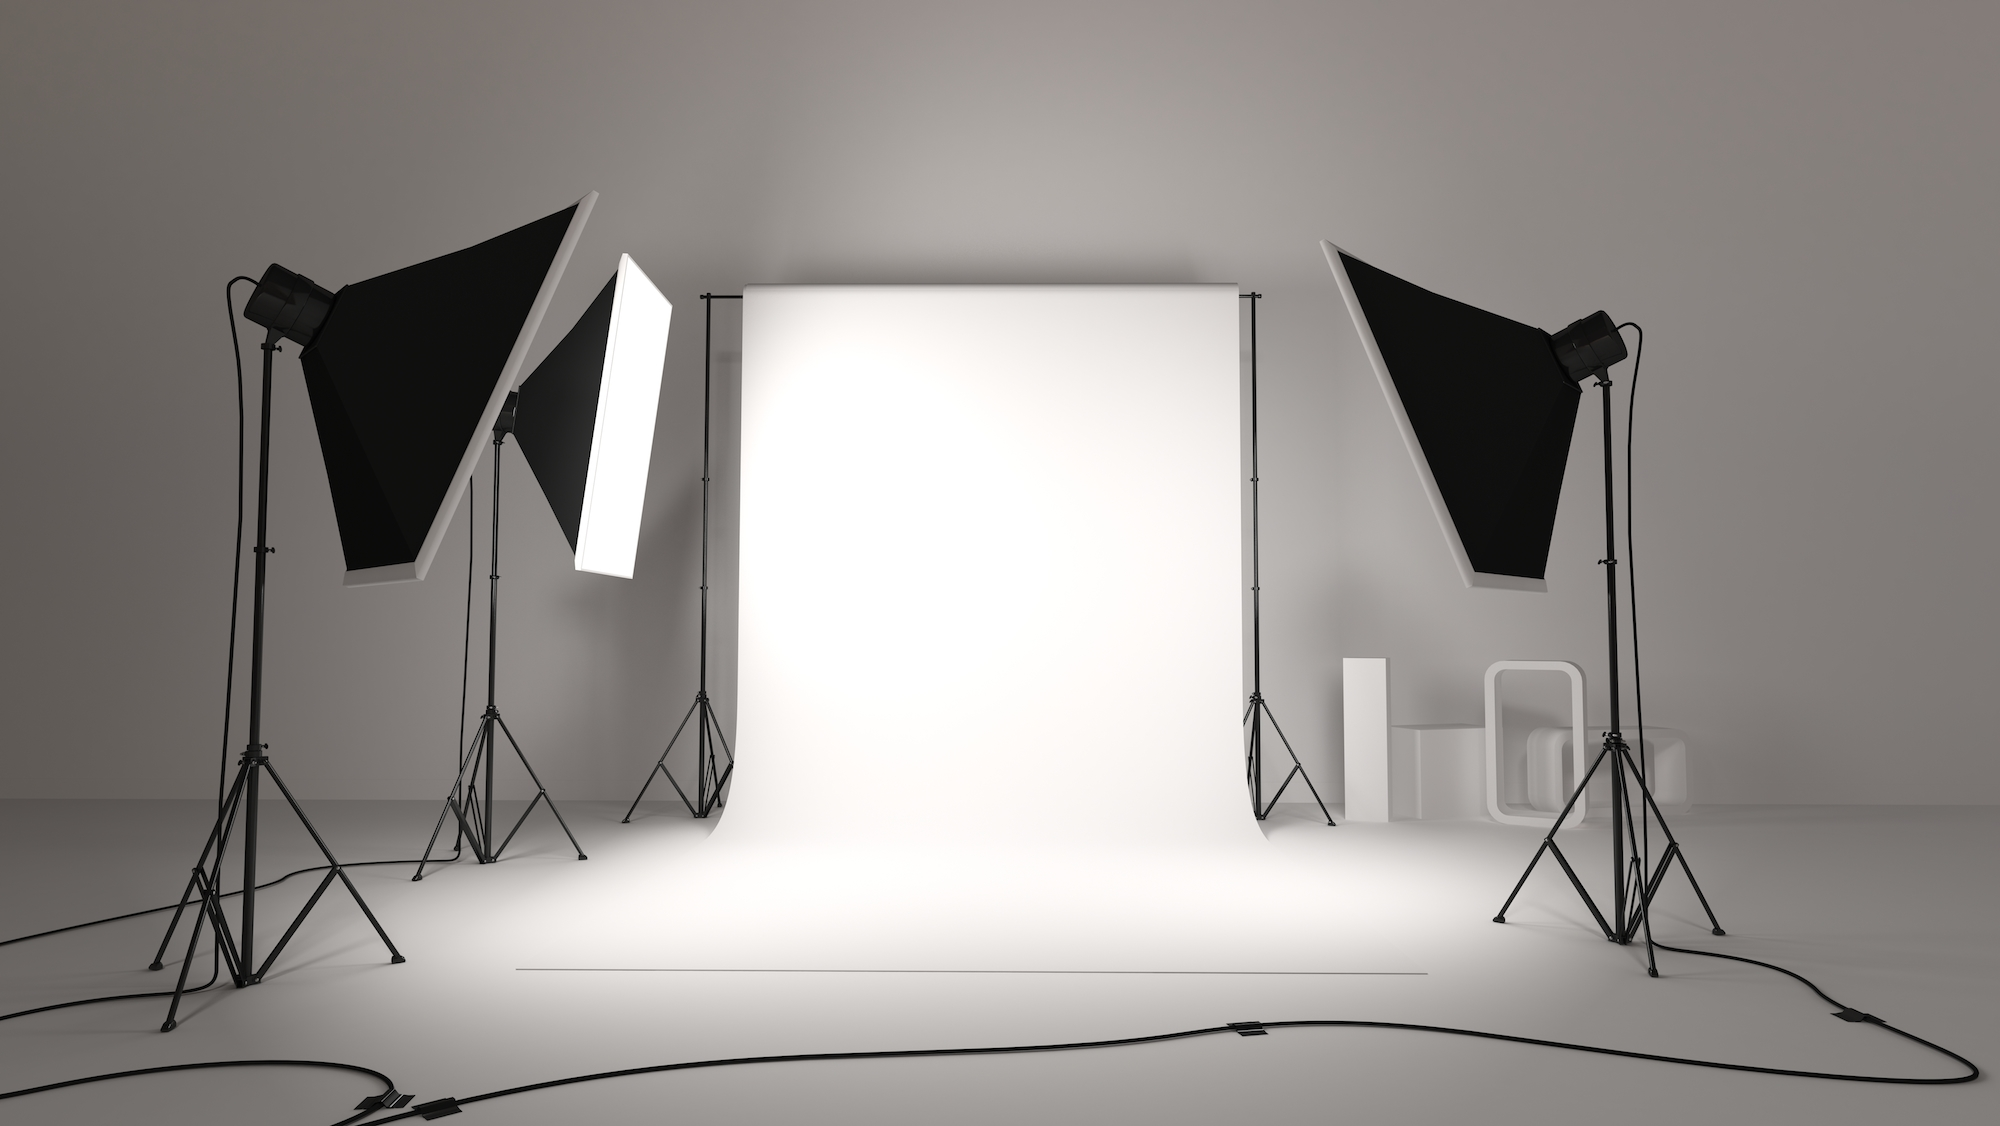 comparatif studio photo test et avis en ao t 2019. Black Bedroom Furniture Sets. Home Design Ideas